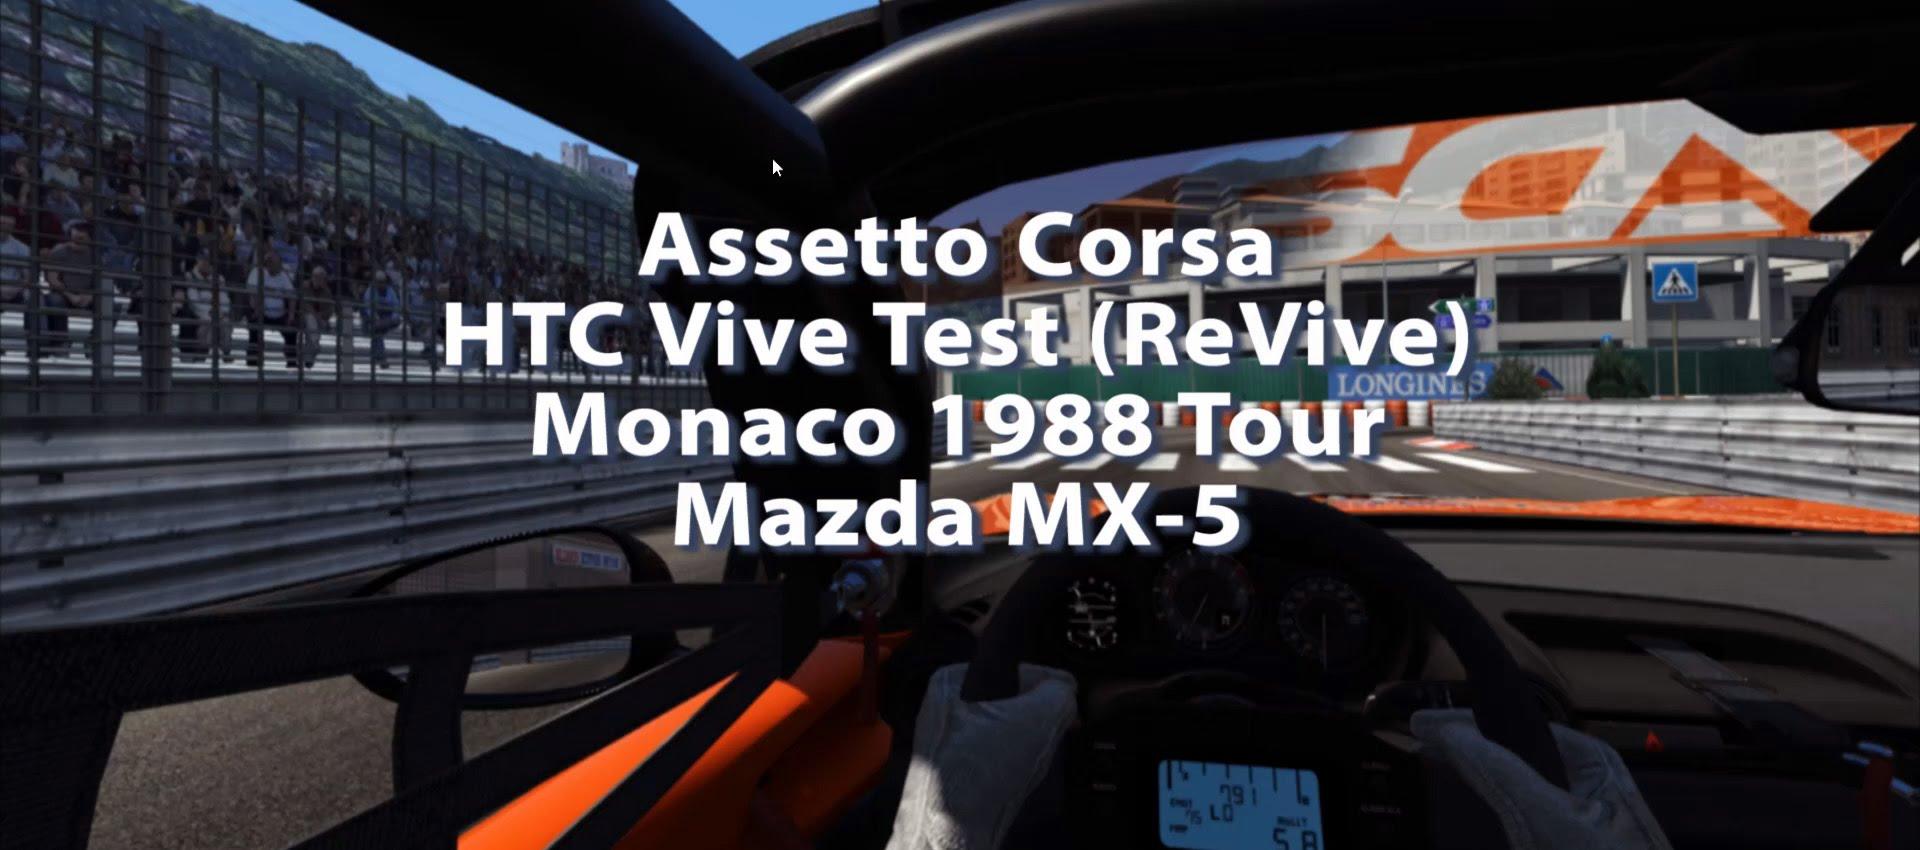 Assetto Corsa - Monaco 1988 - MX-5 - HTC Vive Test